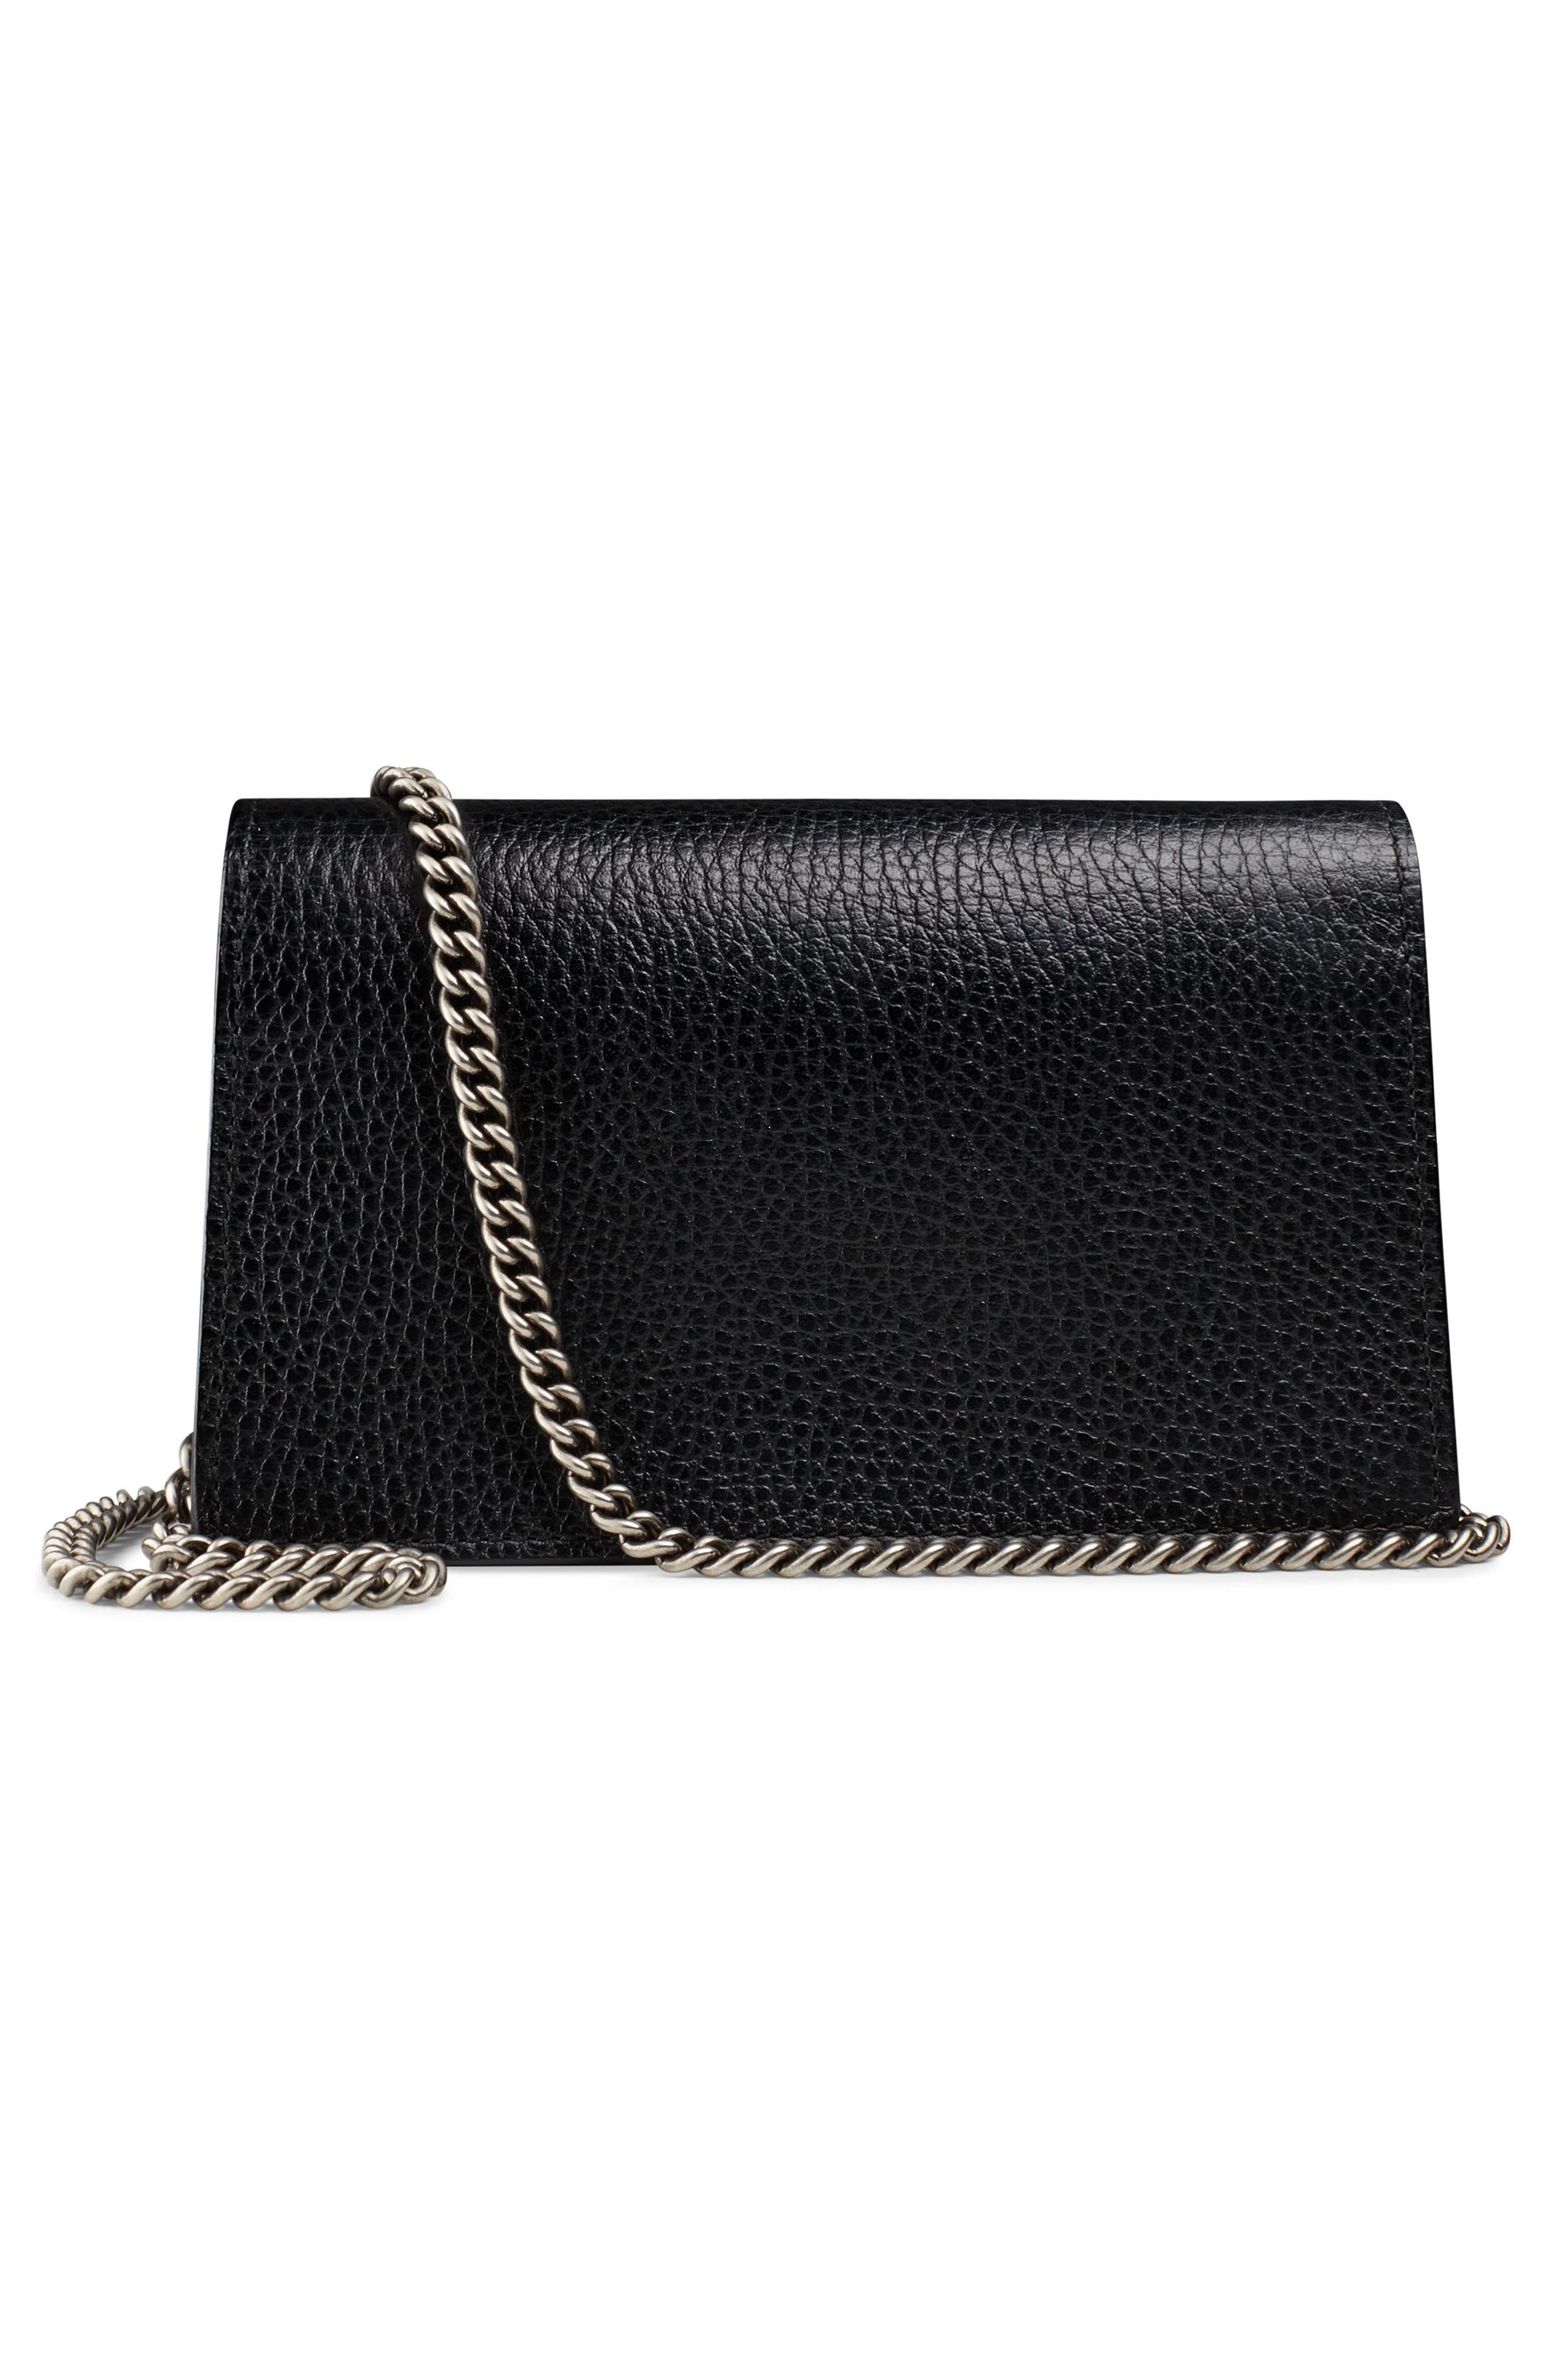 GUCCI,                             Super Mini Dionysus Leather Shoulder Bag,                             Alternate thumbnail 2, color,                             001